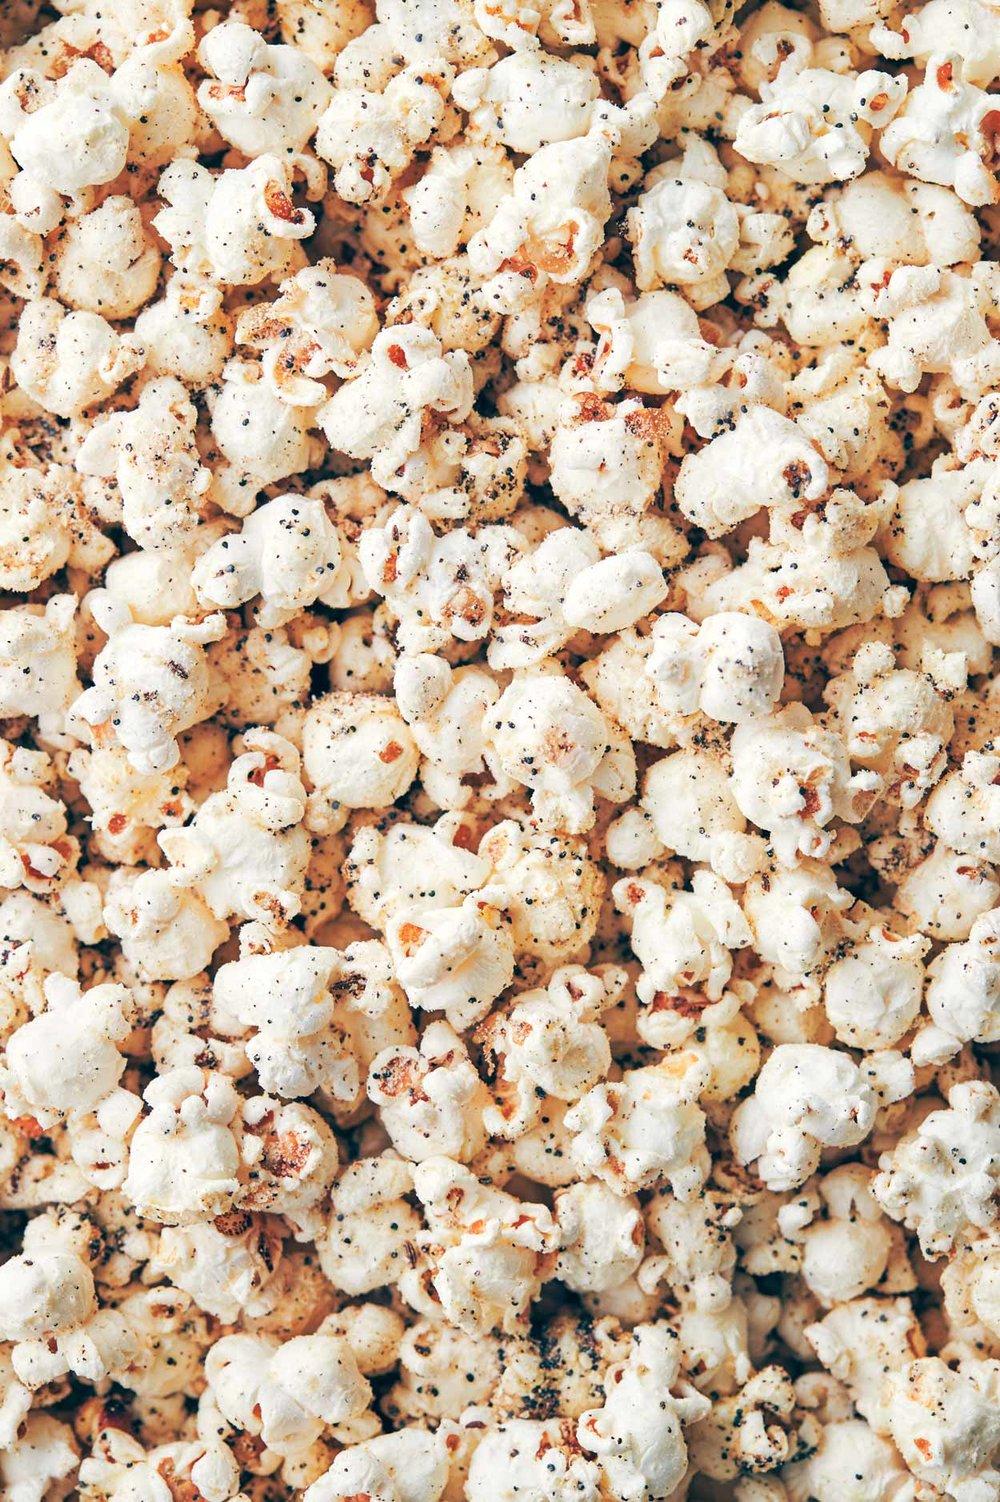 Everything Bagel Popcorn Seasoning | Evergreen Kitchen | Vegan (option), Gluten Free